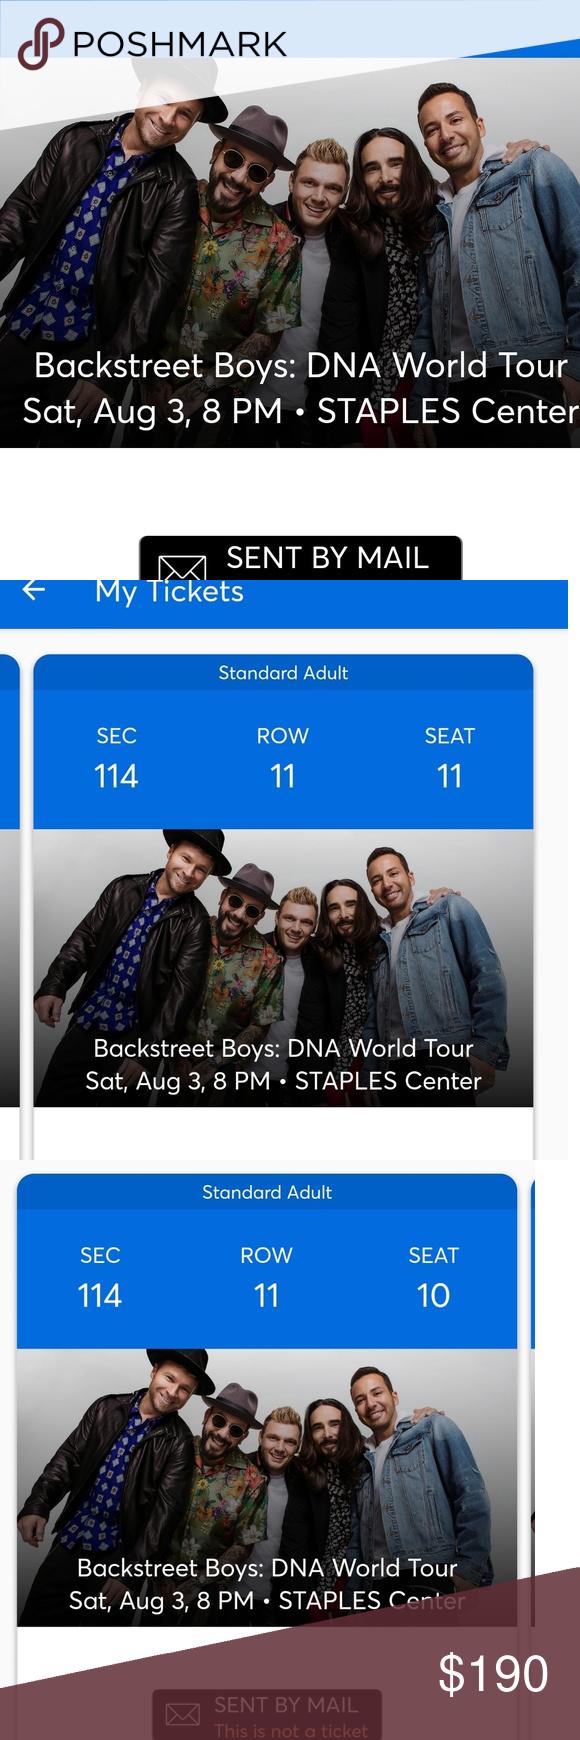 backstreet boy tickets backstreet boys will be here August